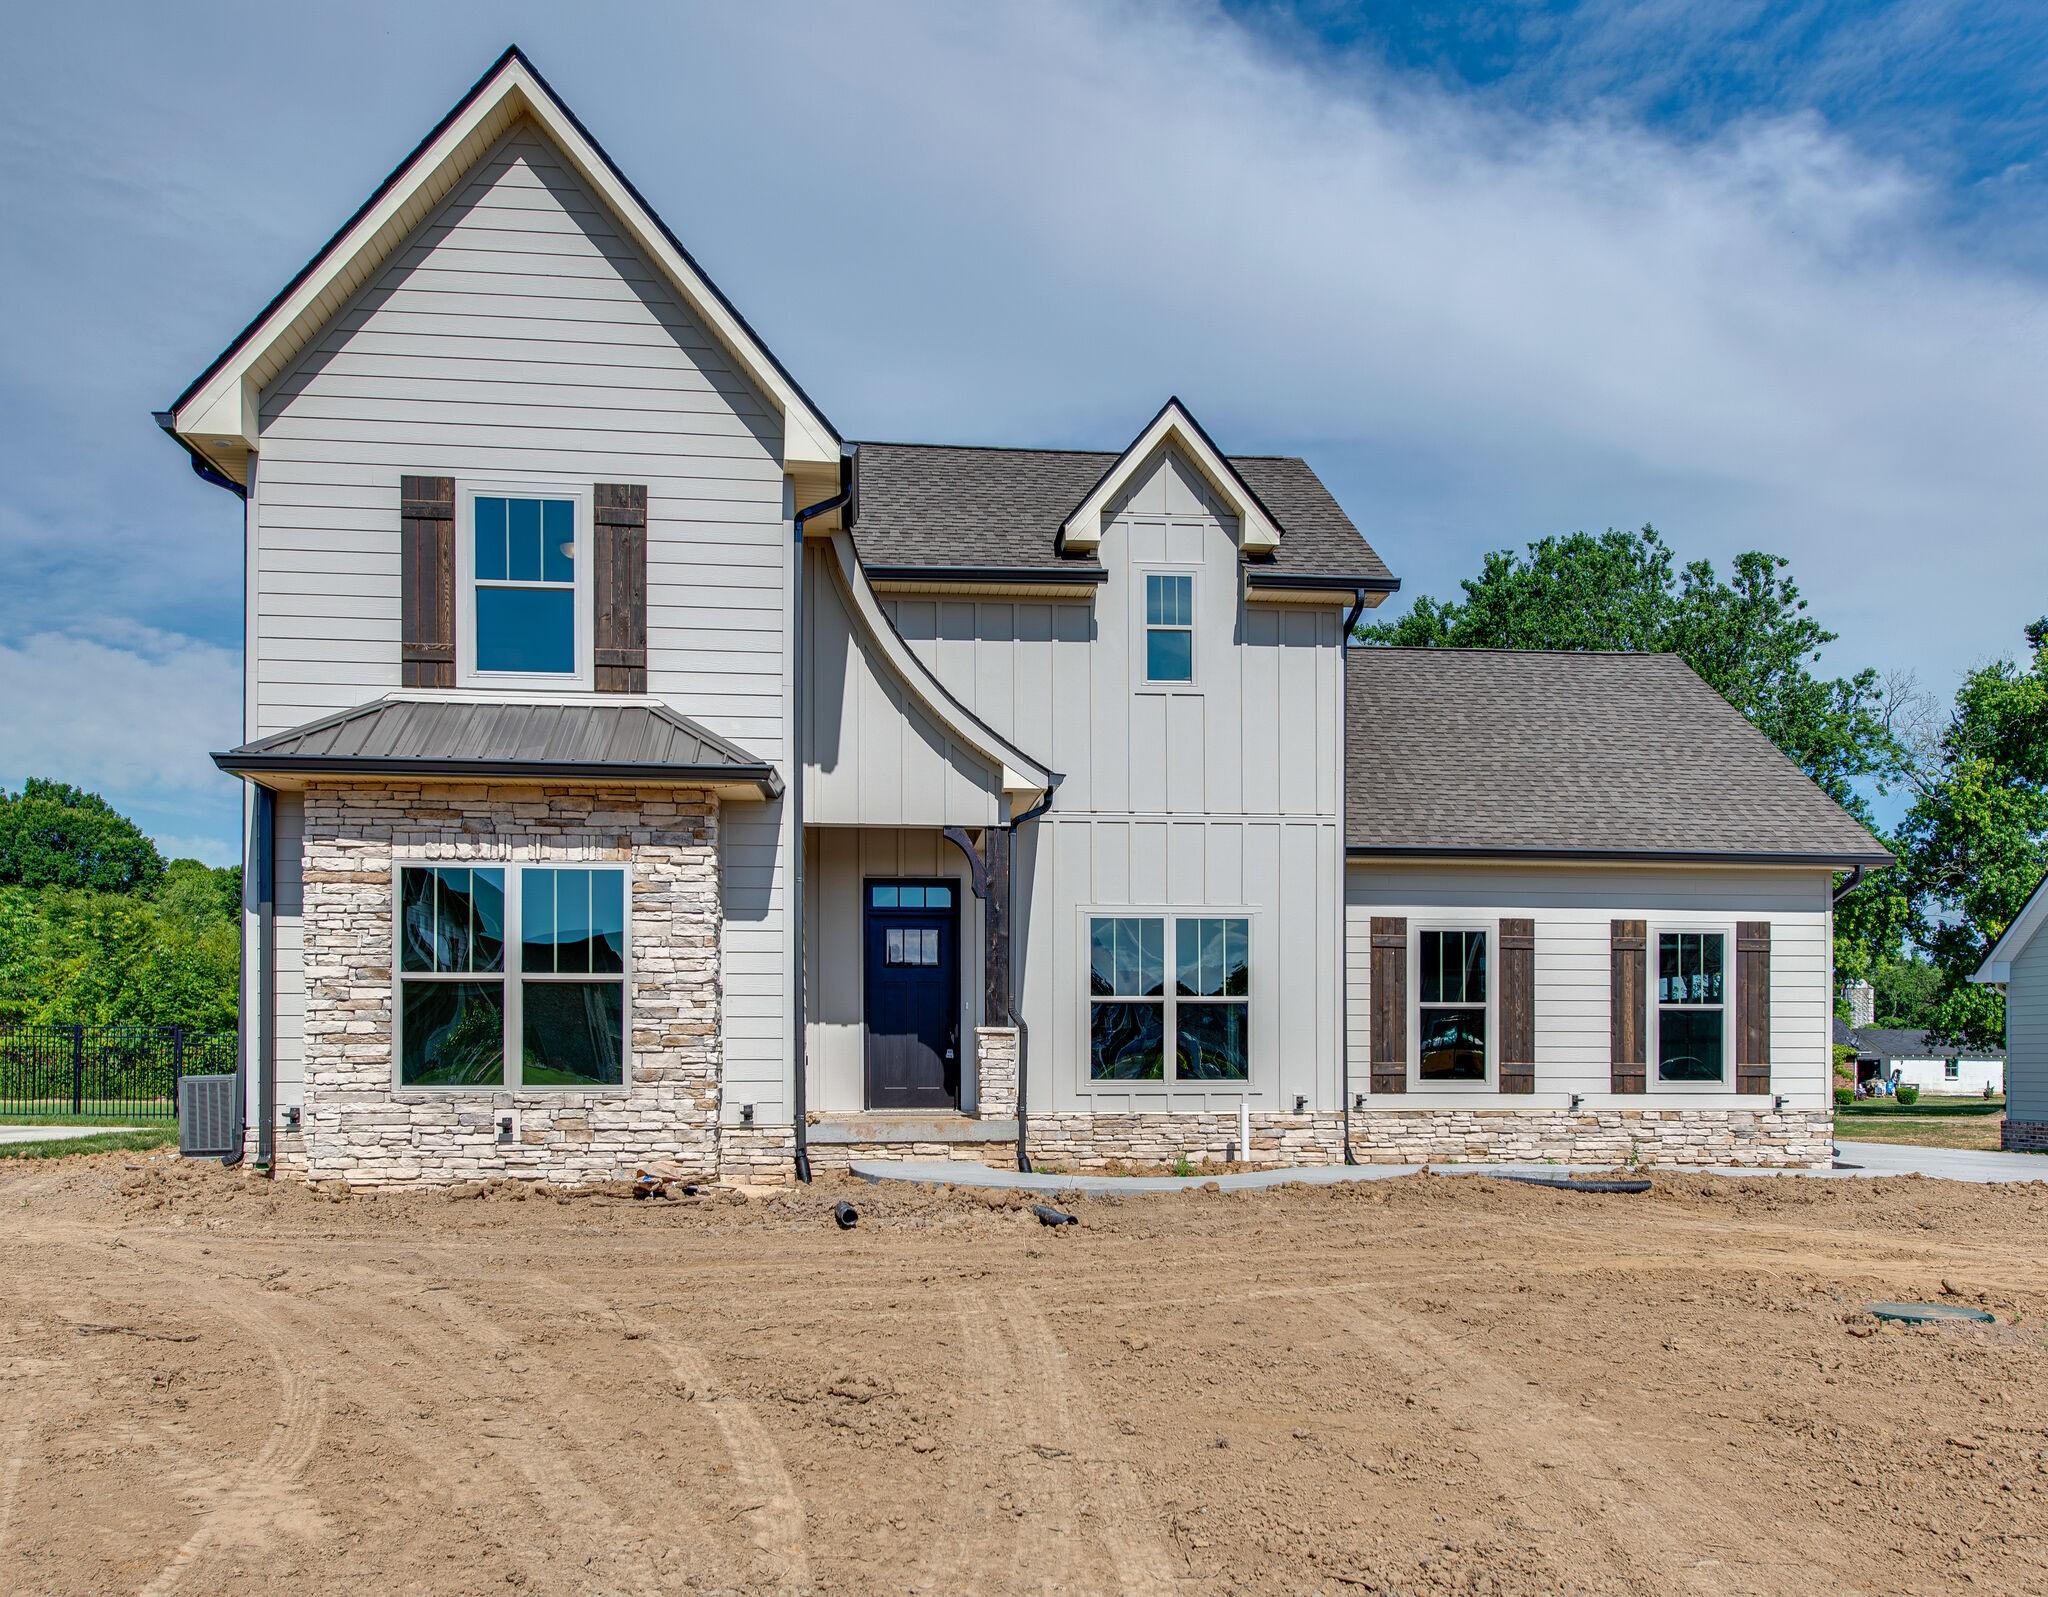 2055 Anglers Retreat Dr Property Photo - Murfreesboro, TN real estate listing